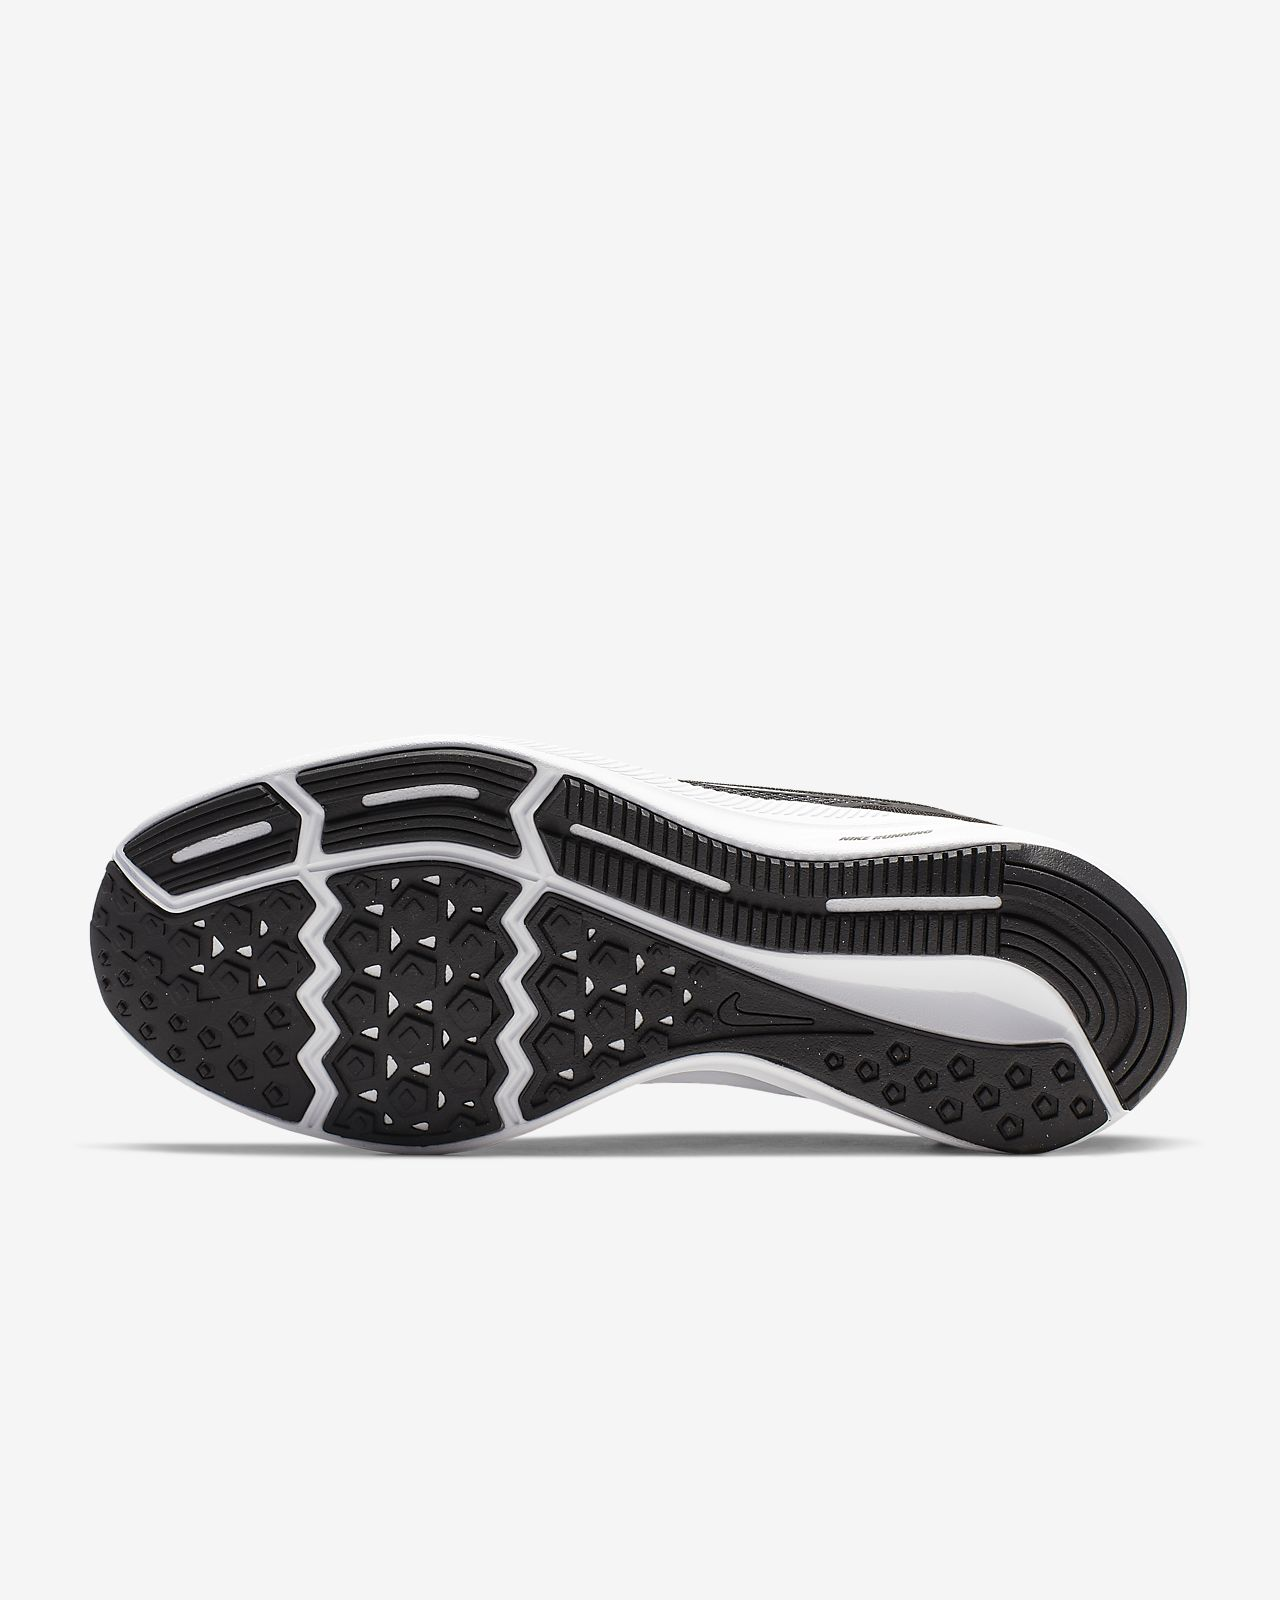 Tênis Nike Downshifter 9 Preto Compre Agora | Kanui Brasil